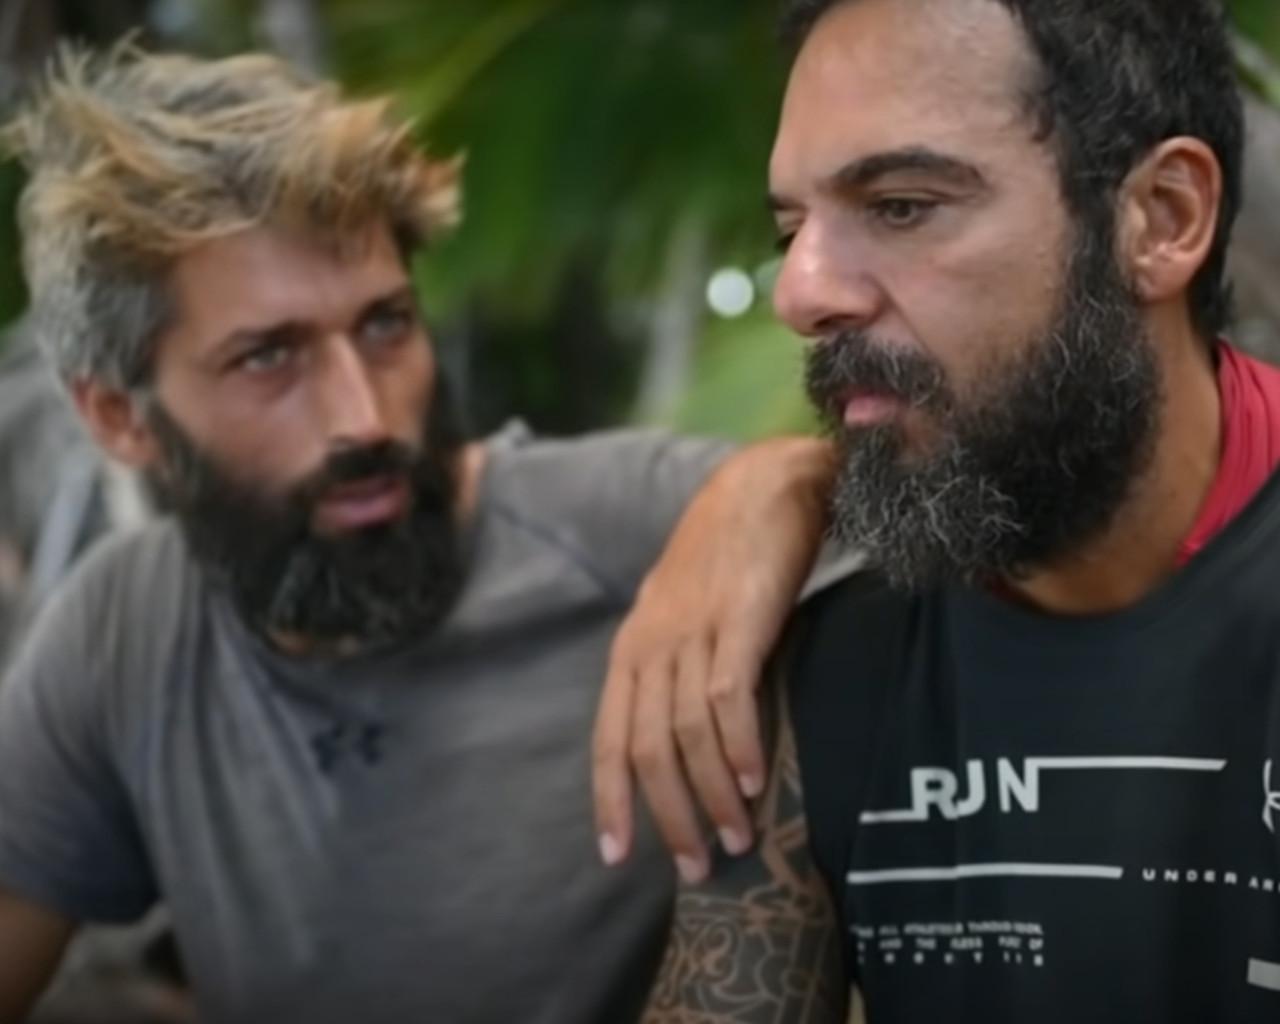 Survivor 4: συνεργασία-βόμβα! Τι ετοιμάζουν Τριαντάφυλλος και Παππάς μαζί στην τηλεόραση τη νέα σεζόν;